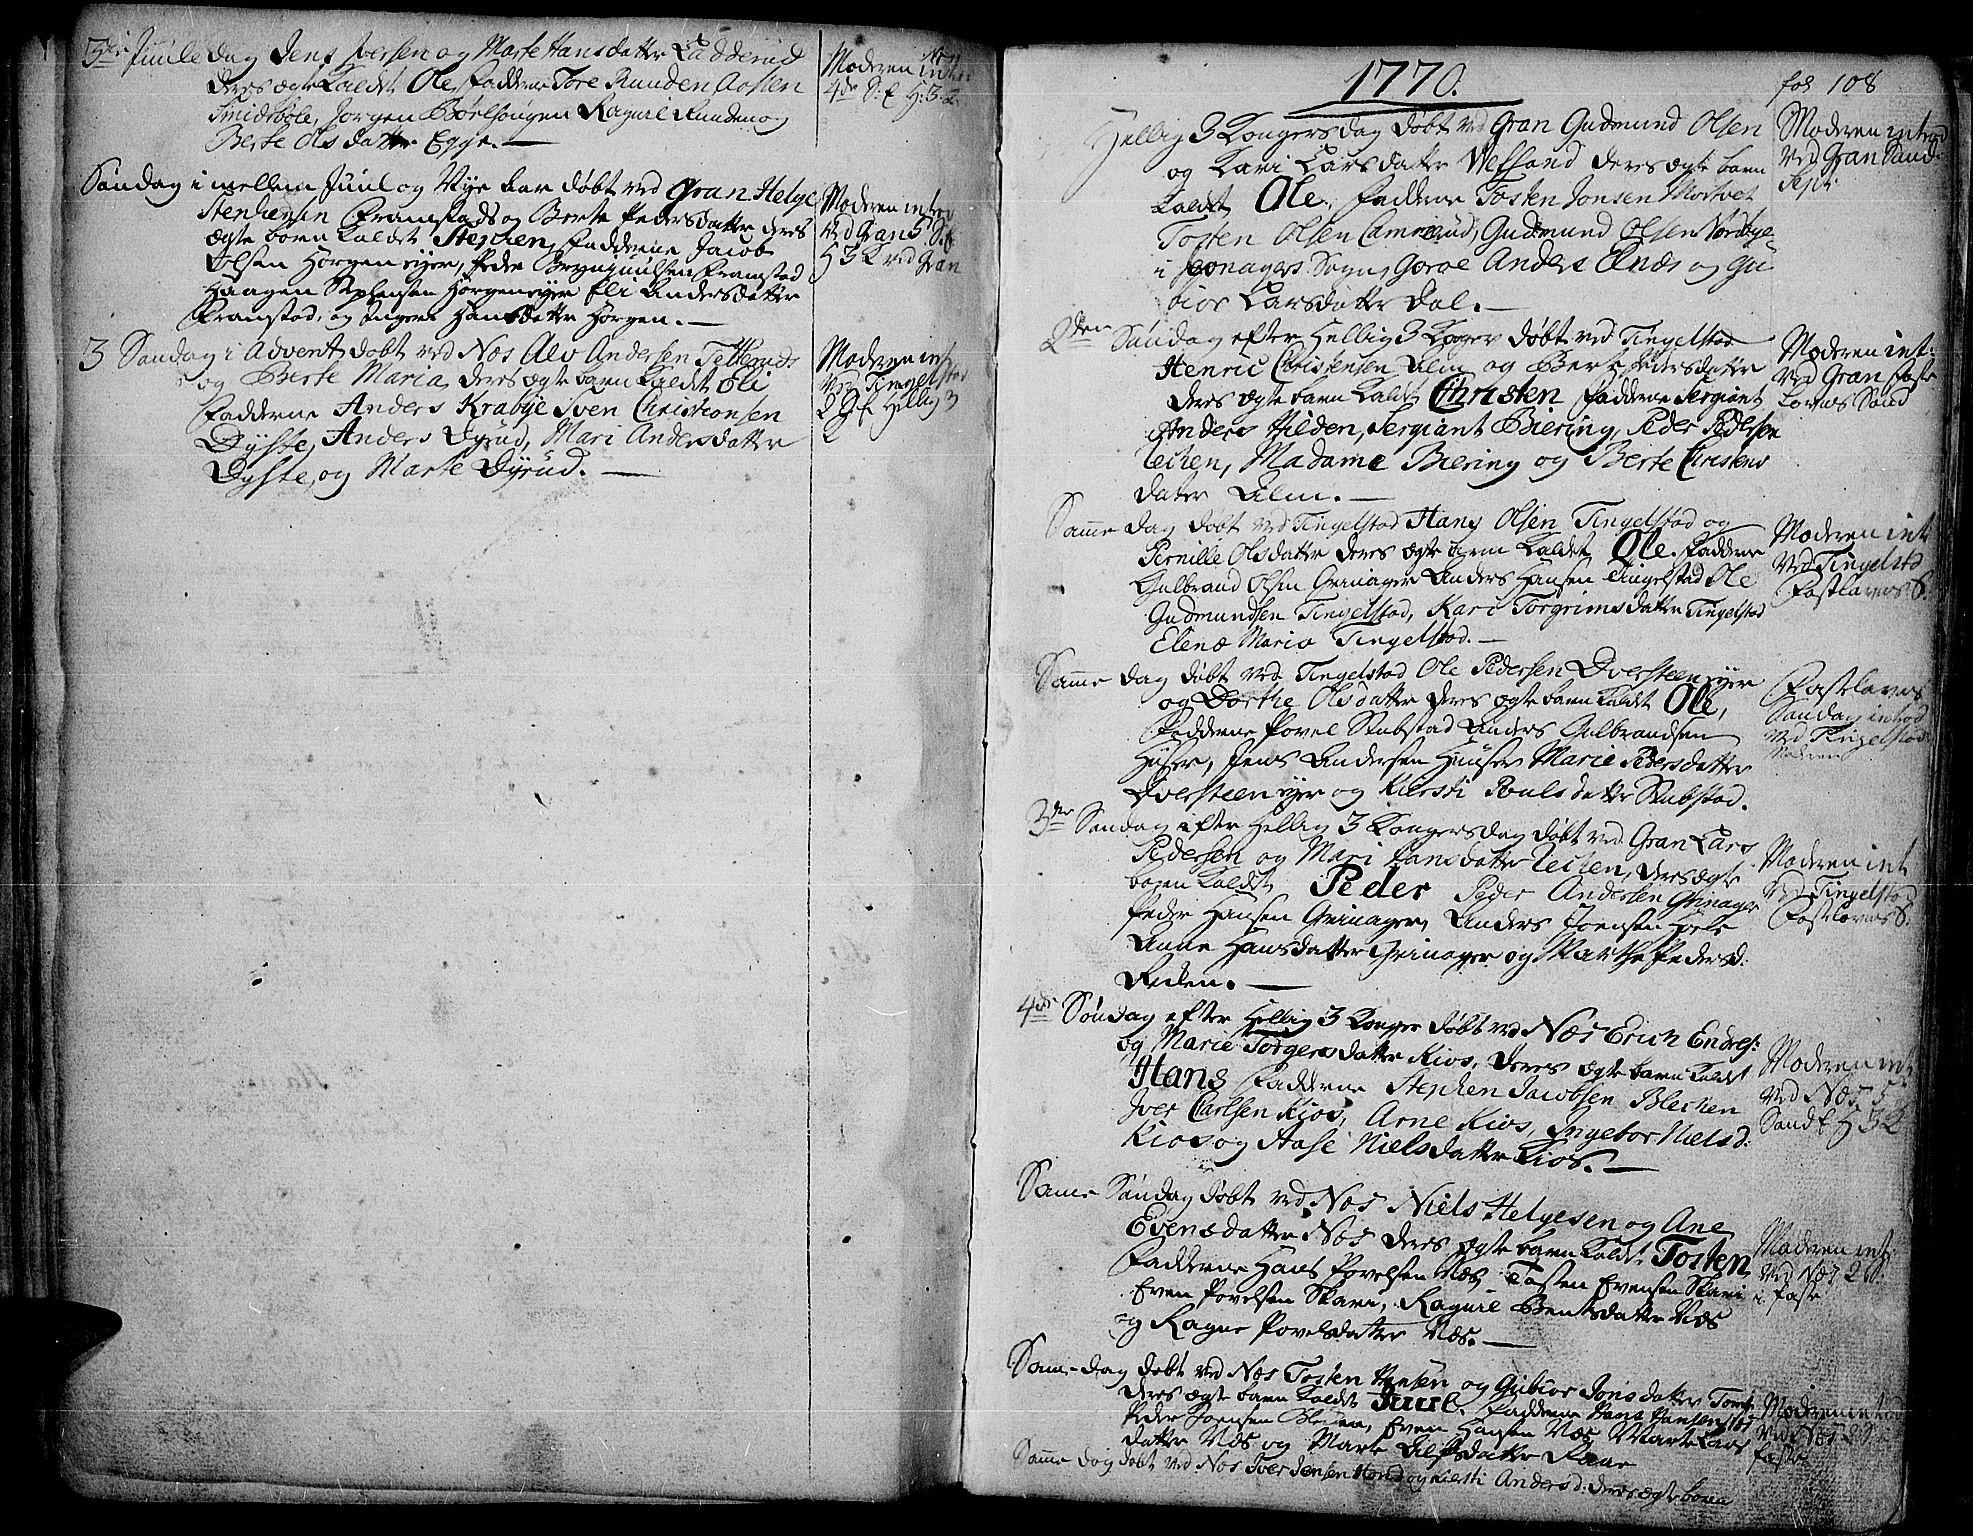 SAH, Gran prestekontor, Ministerialbok nr. 4, 1759-1775, s. 108